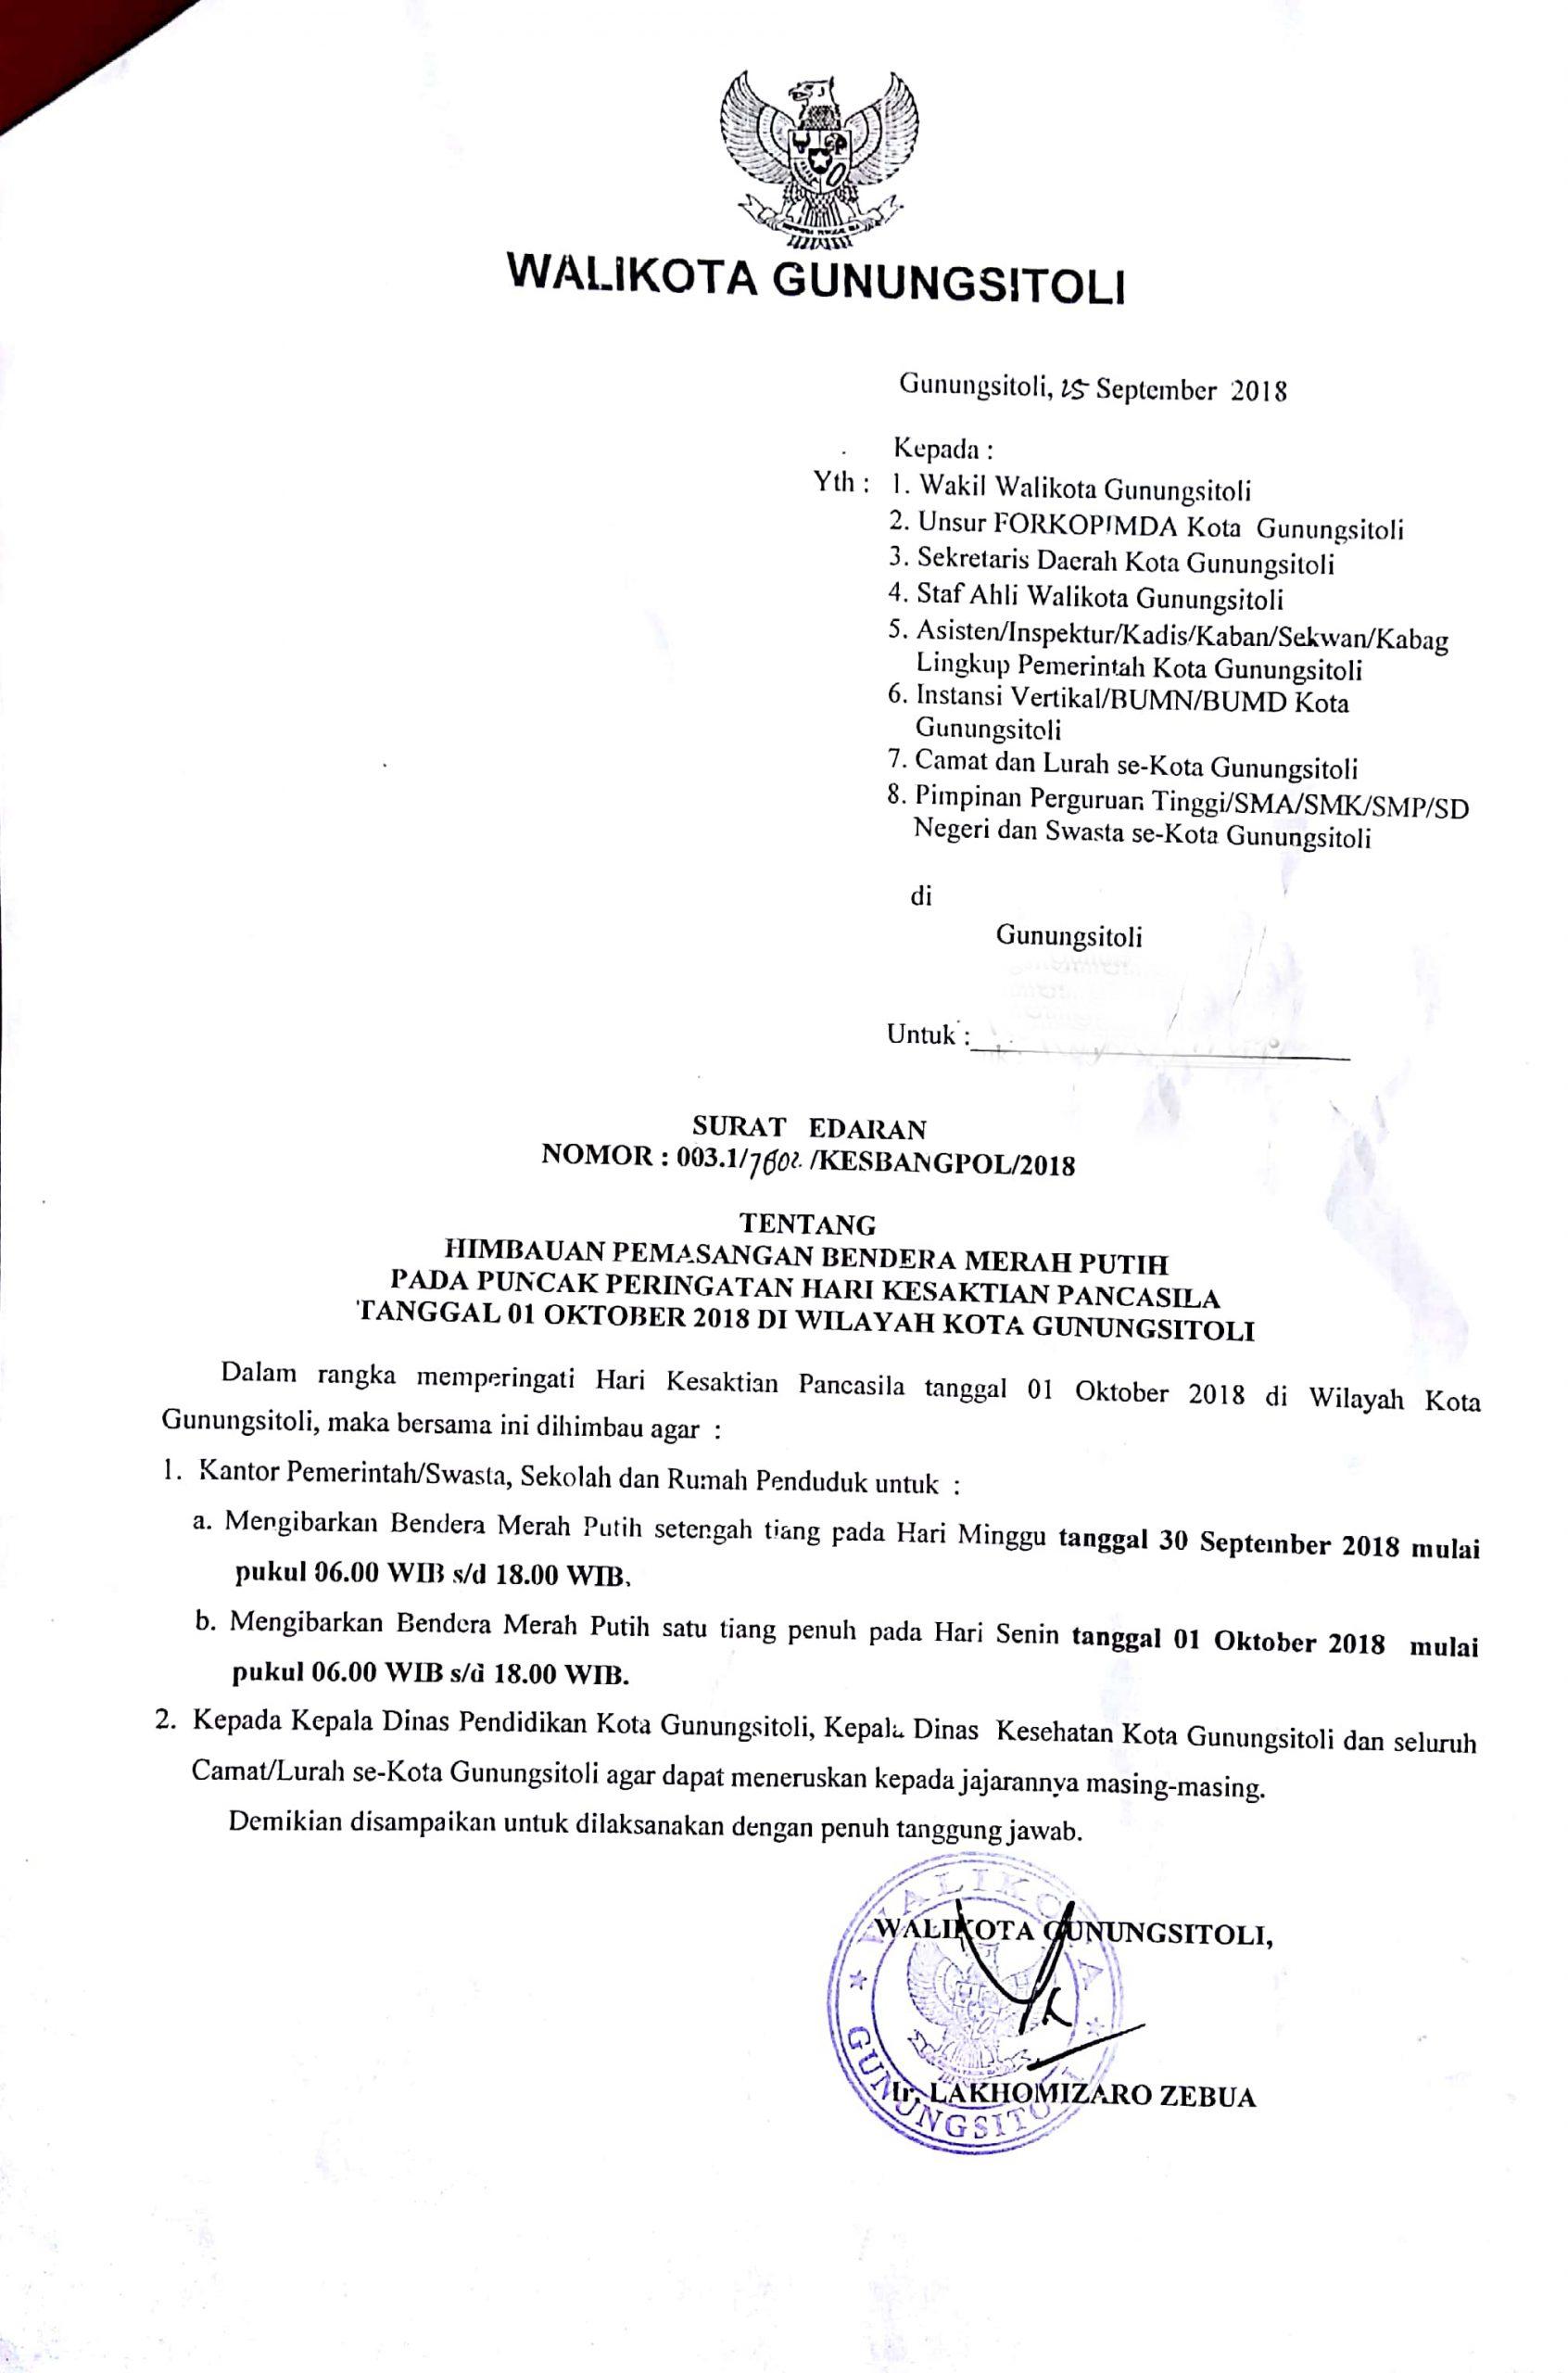 Surat Edaran Himbauan Pemasangan Bendera Merah Putih Pemko